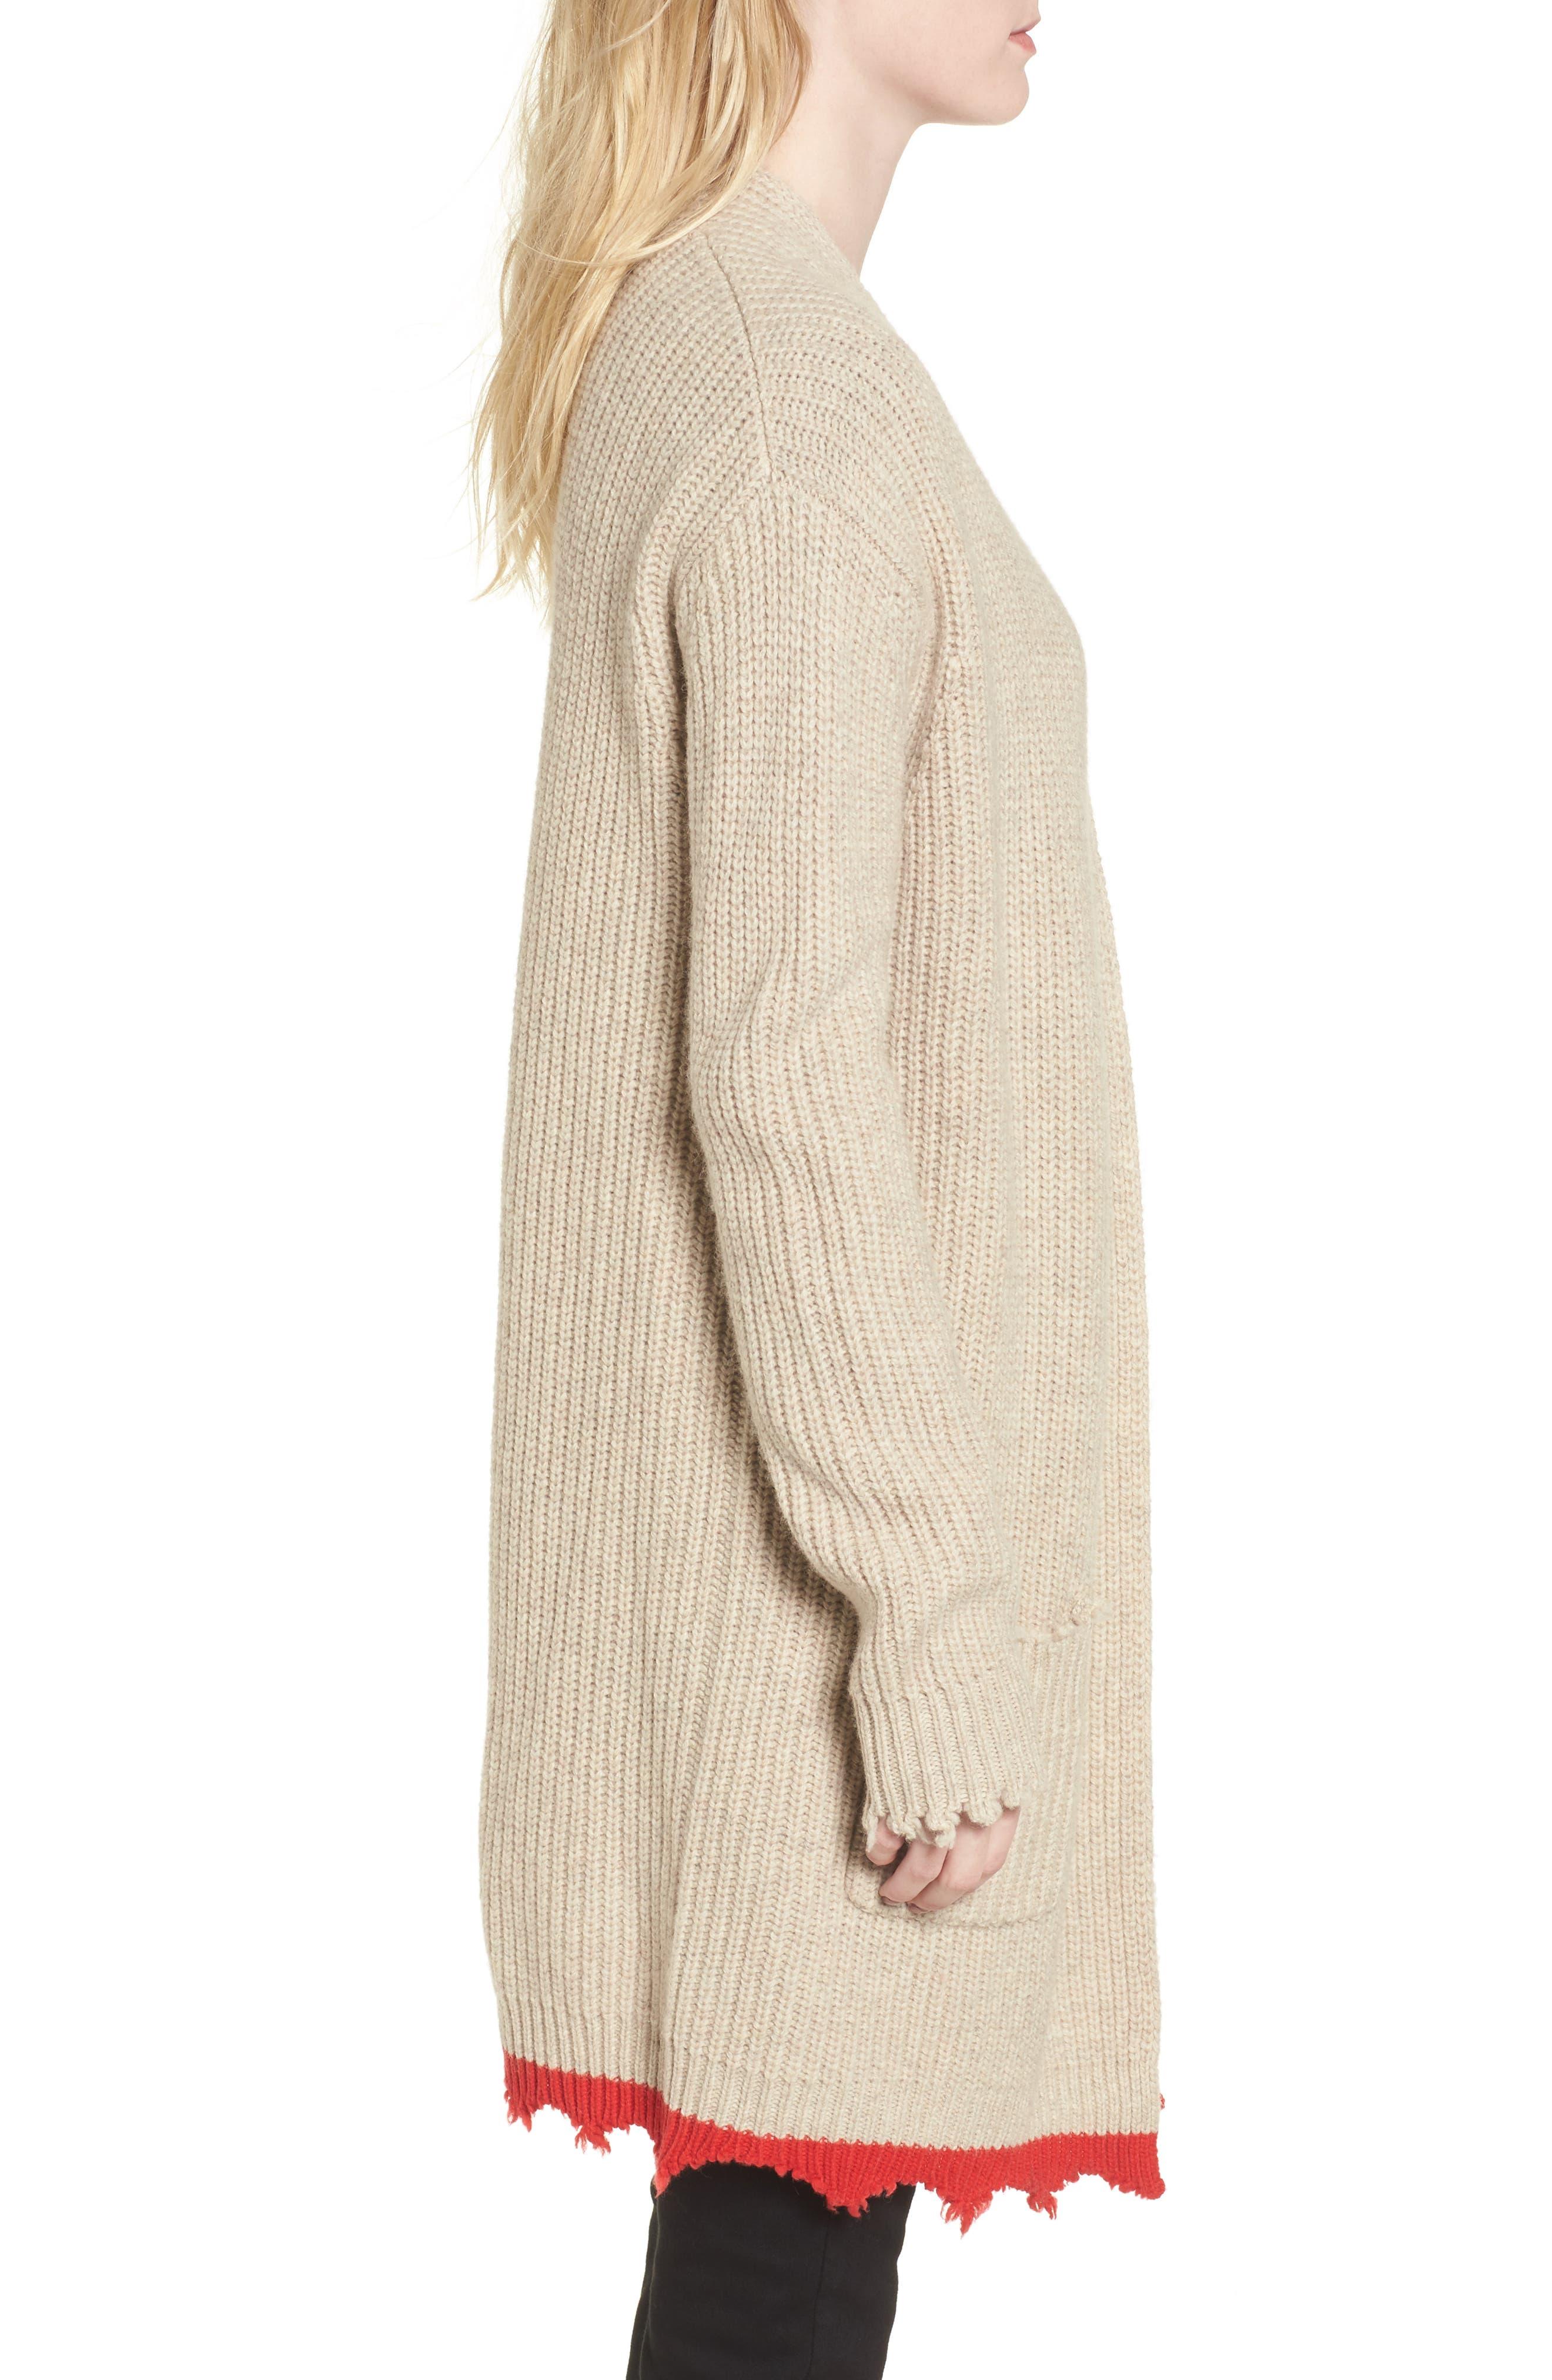 Rita Cardigan Sweater,                             Alternate thumbnail 3, color,